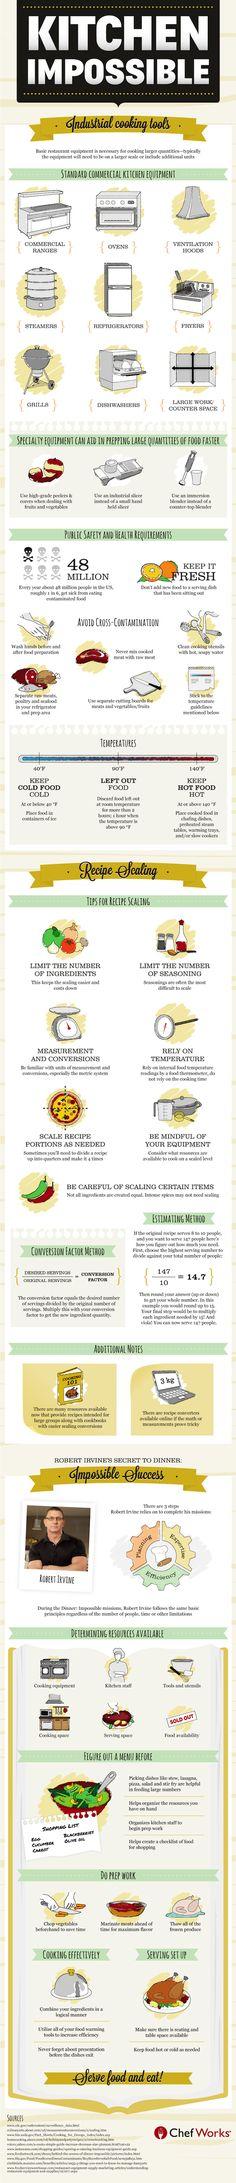 Mega Meals: Kitchen Impossible - Infographic #ChefSecrets